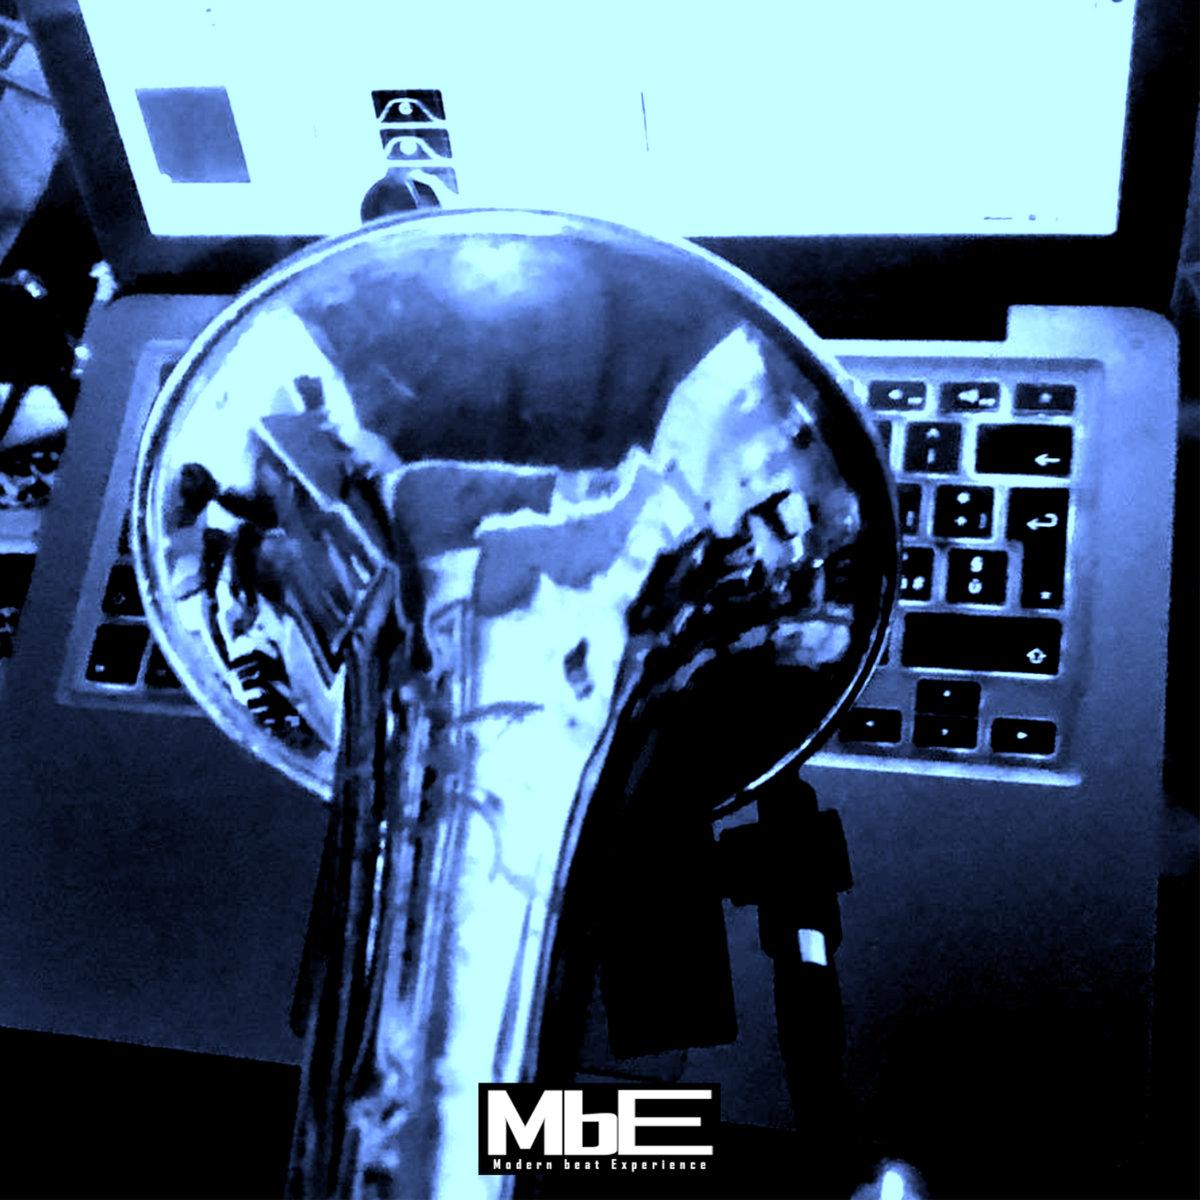 Modern Beat Experience - EP2021 - Officine Musicali - Sassari - Bandcamp - ascolti - album - ep - 2021 - Sa Scena - 16 gennaio 2021